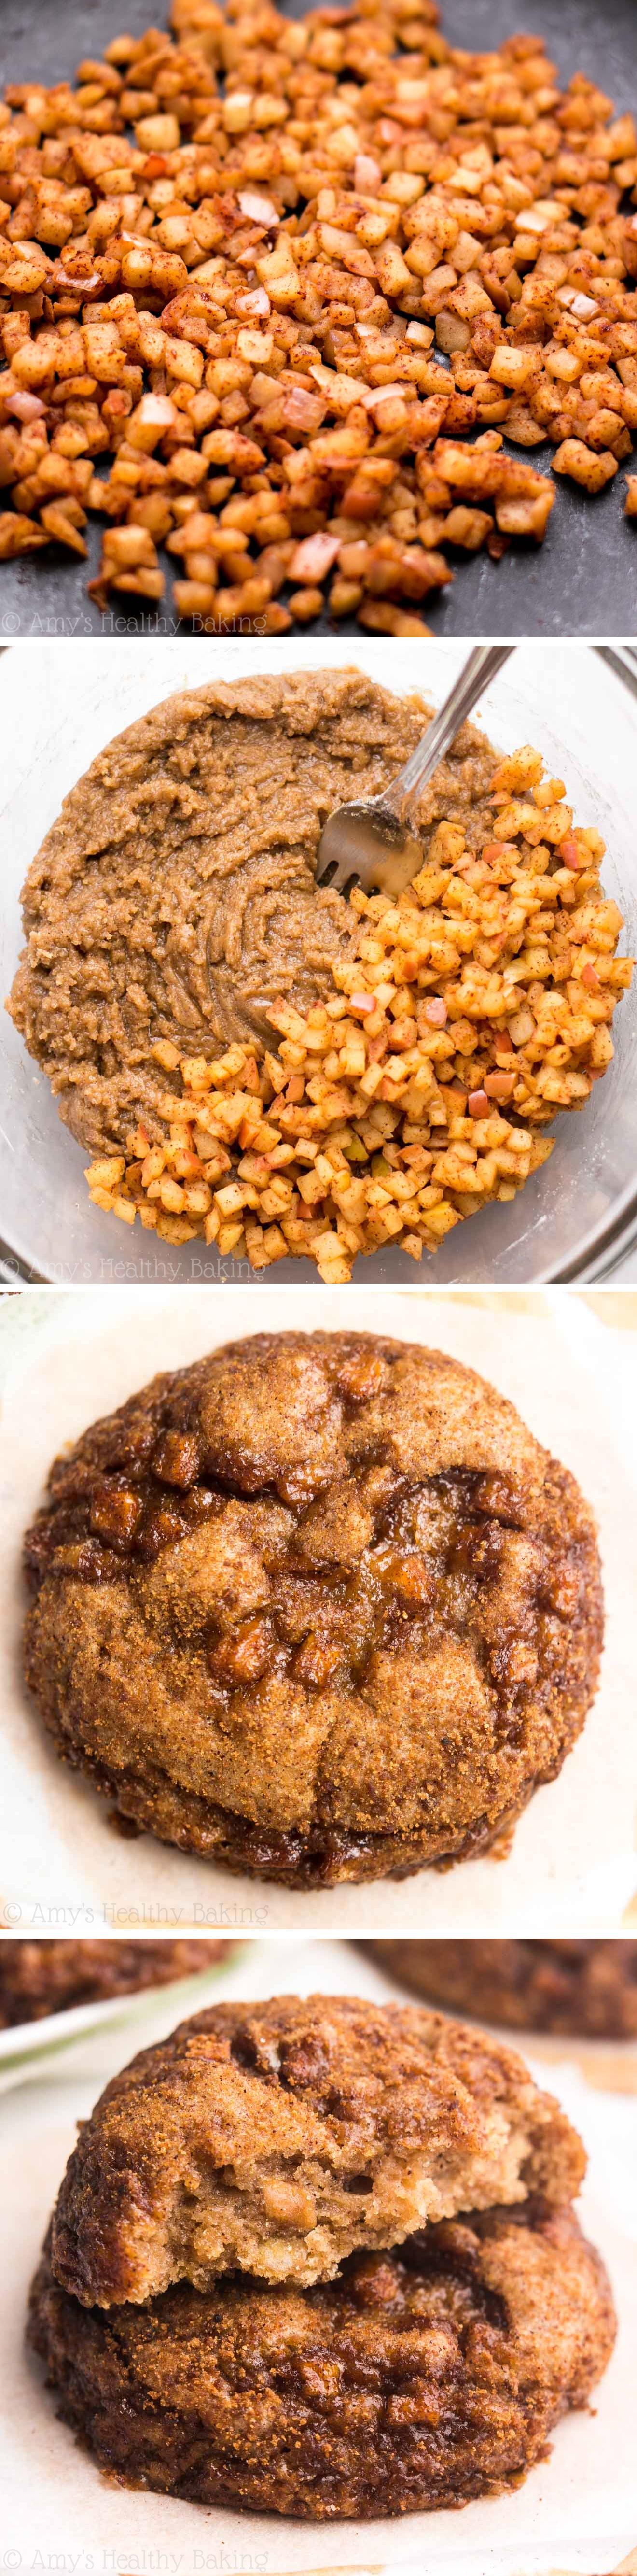 Apple Pie Snickerdoodles Amy S Healthy Baking